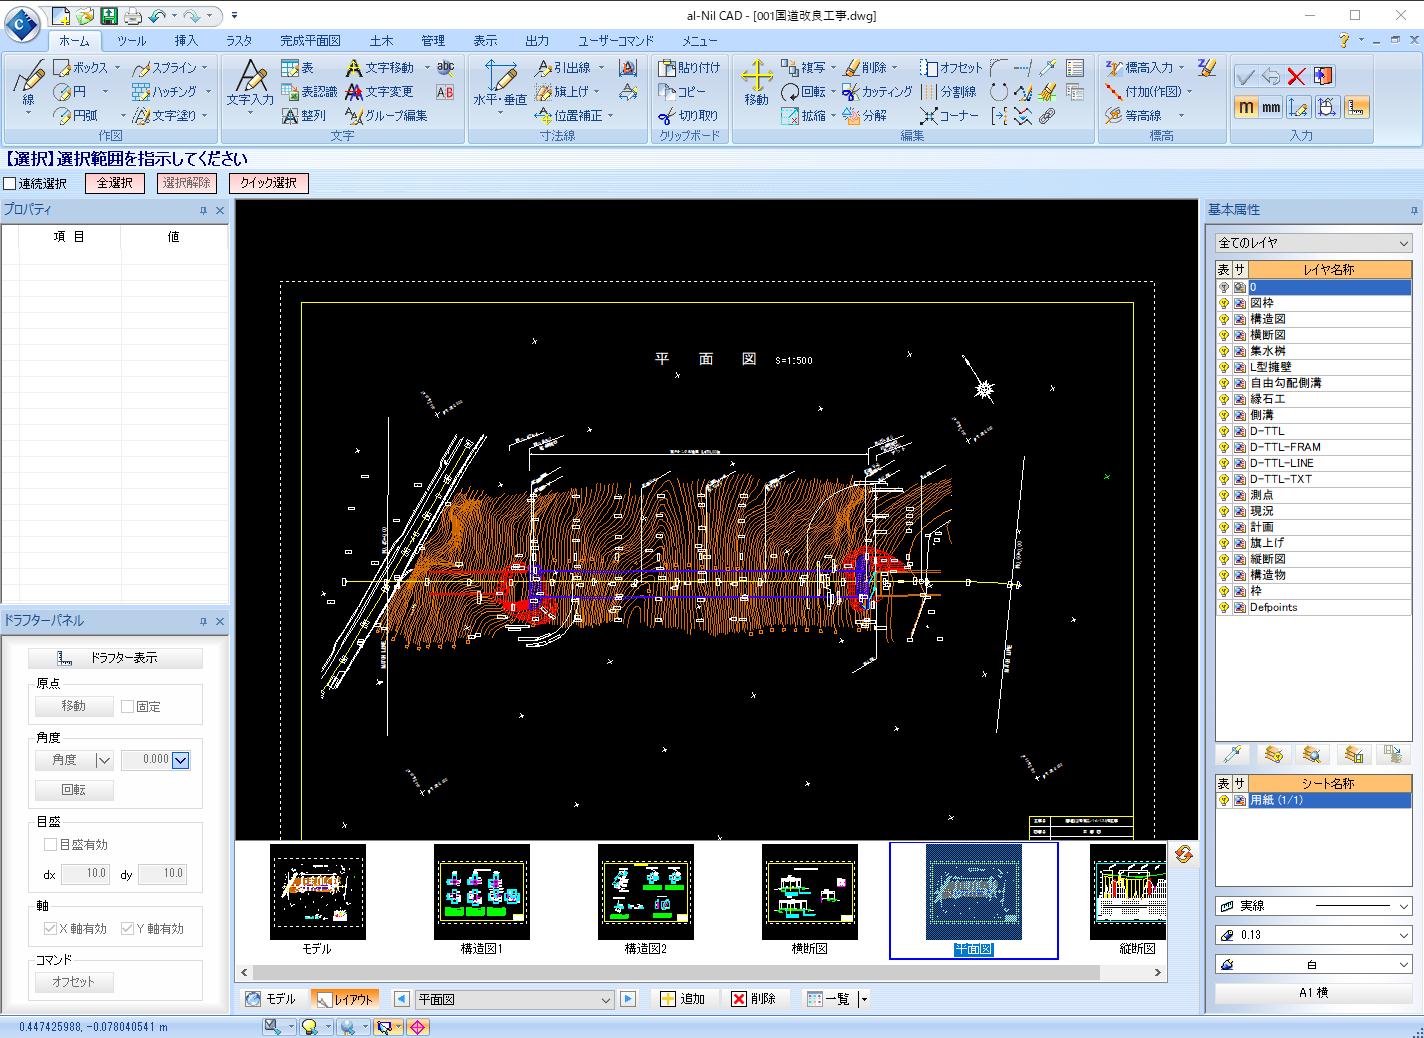 CADソフトウェア製品案内 / Bigvan al-Nil 2020 CADオプション機能紹介 ...